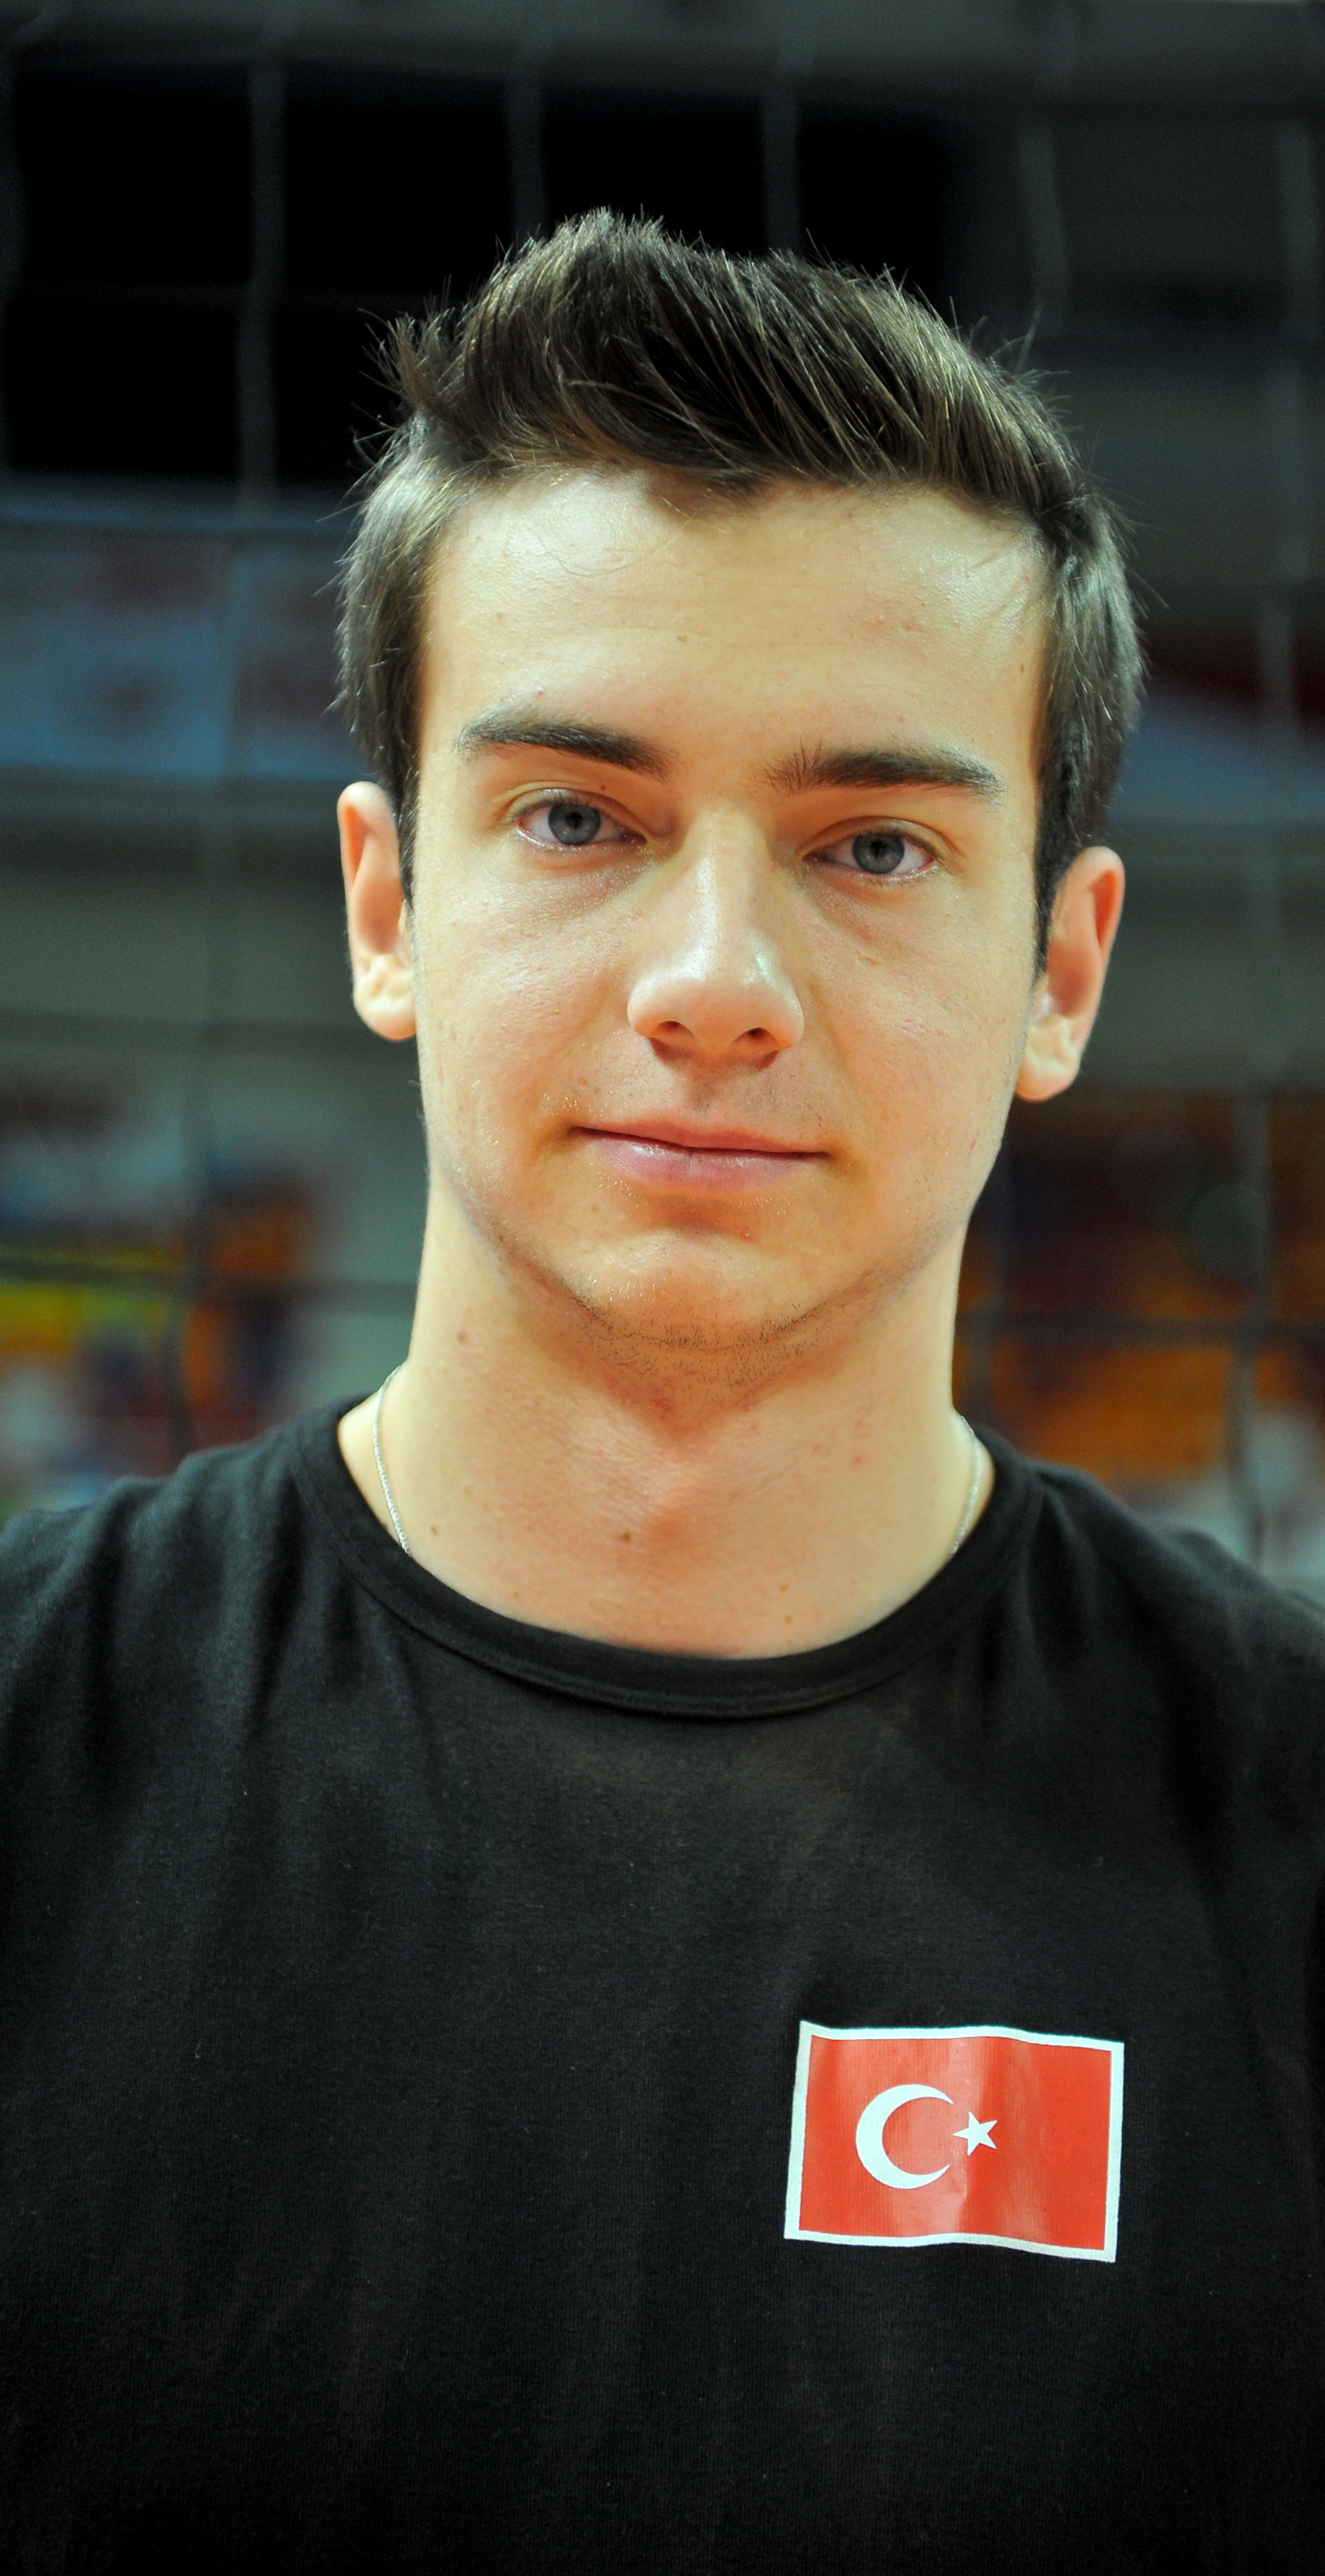 Osman Cagatay Durmaz